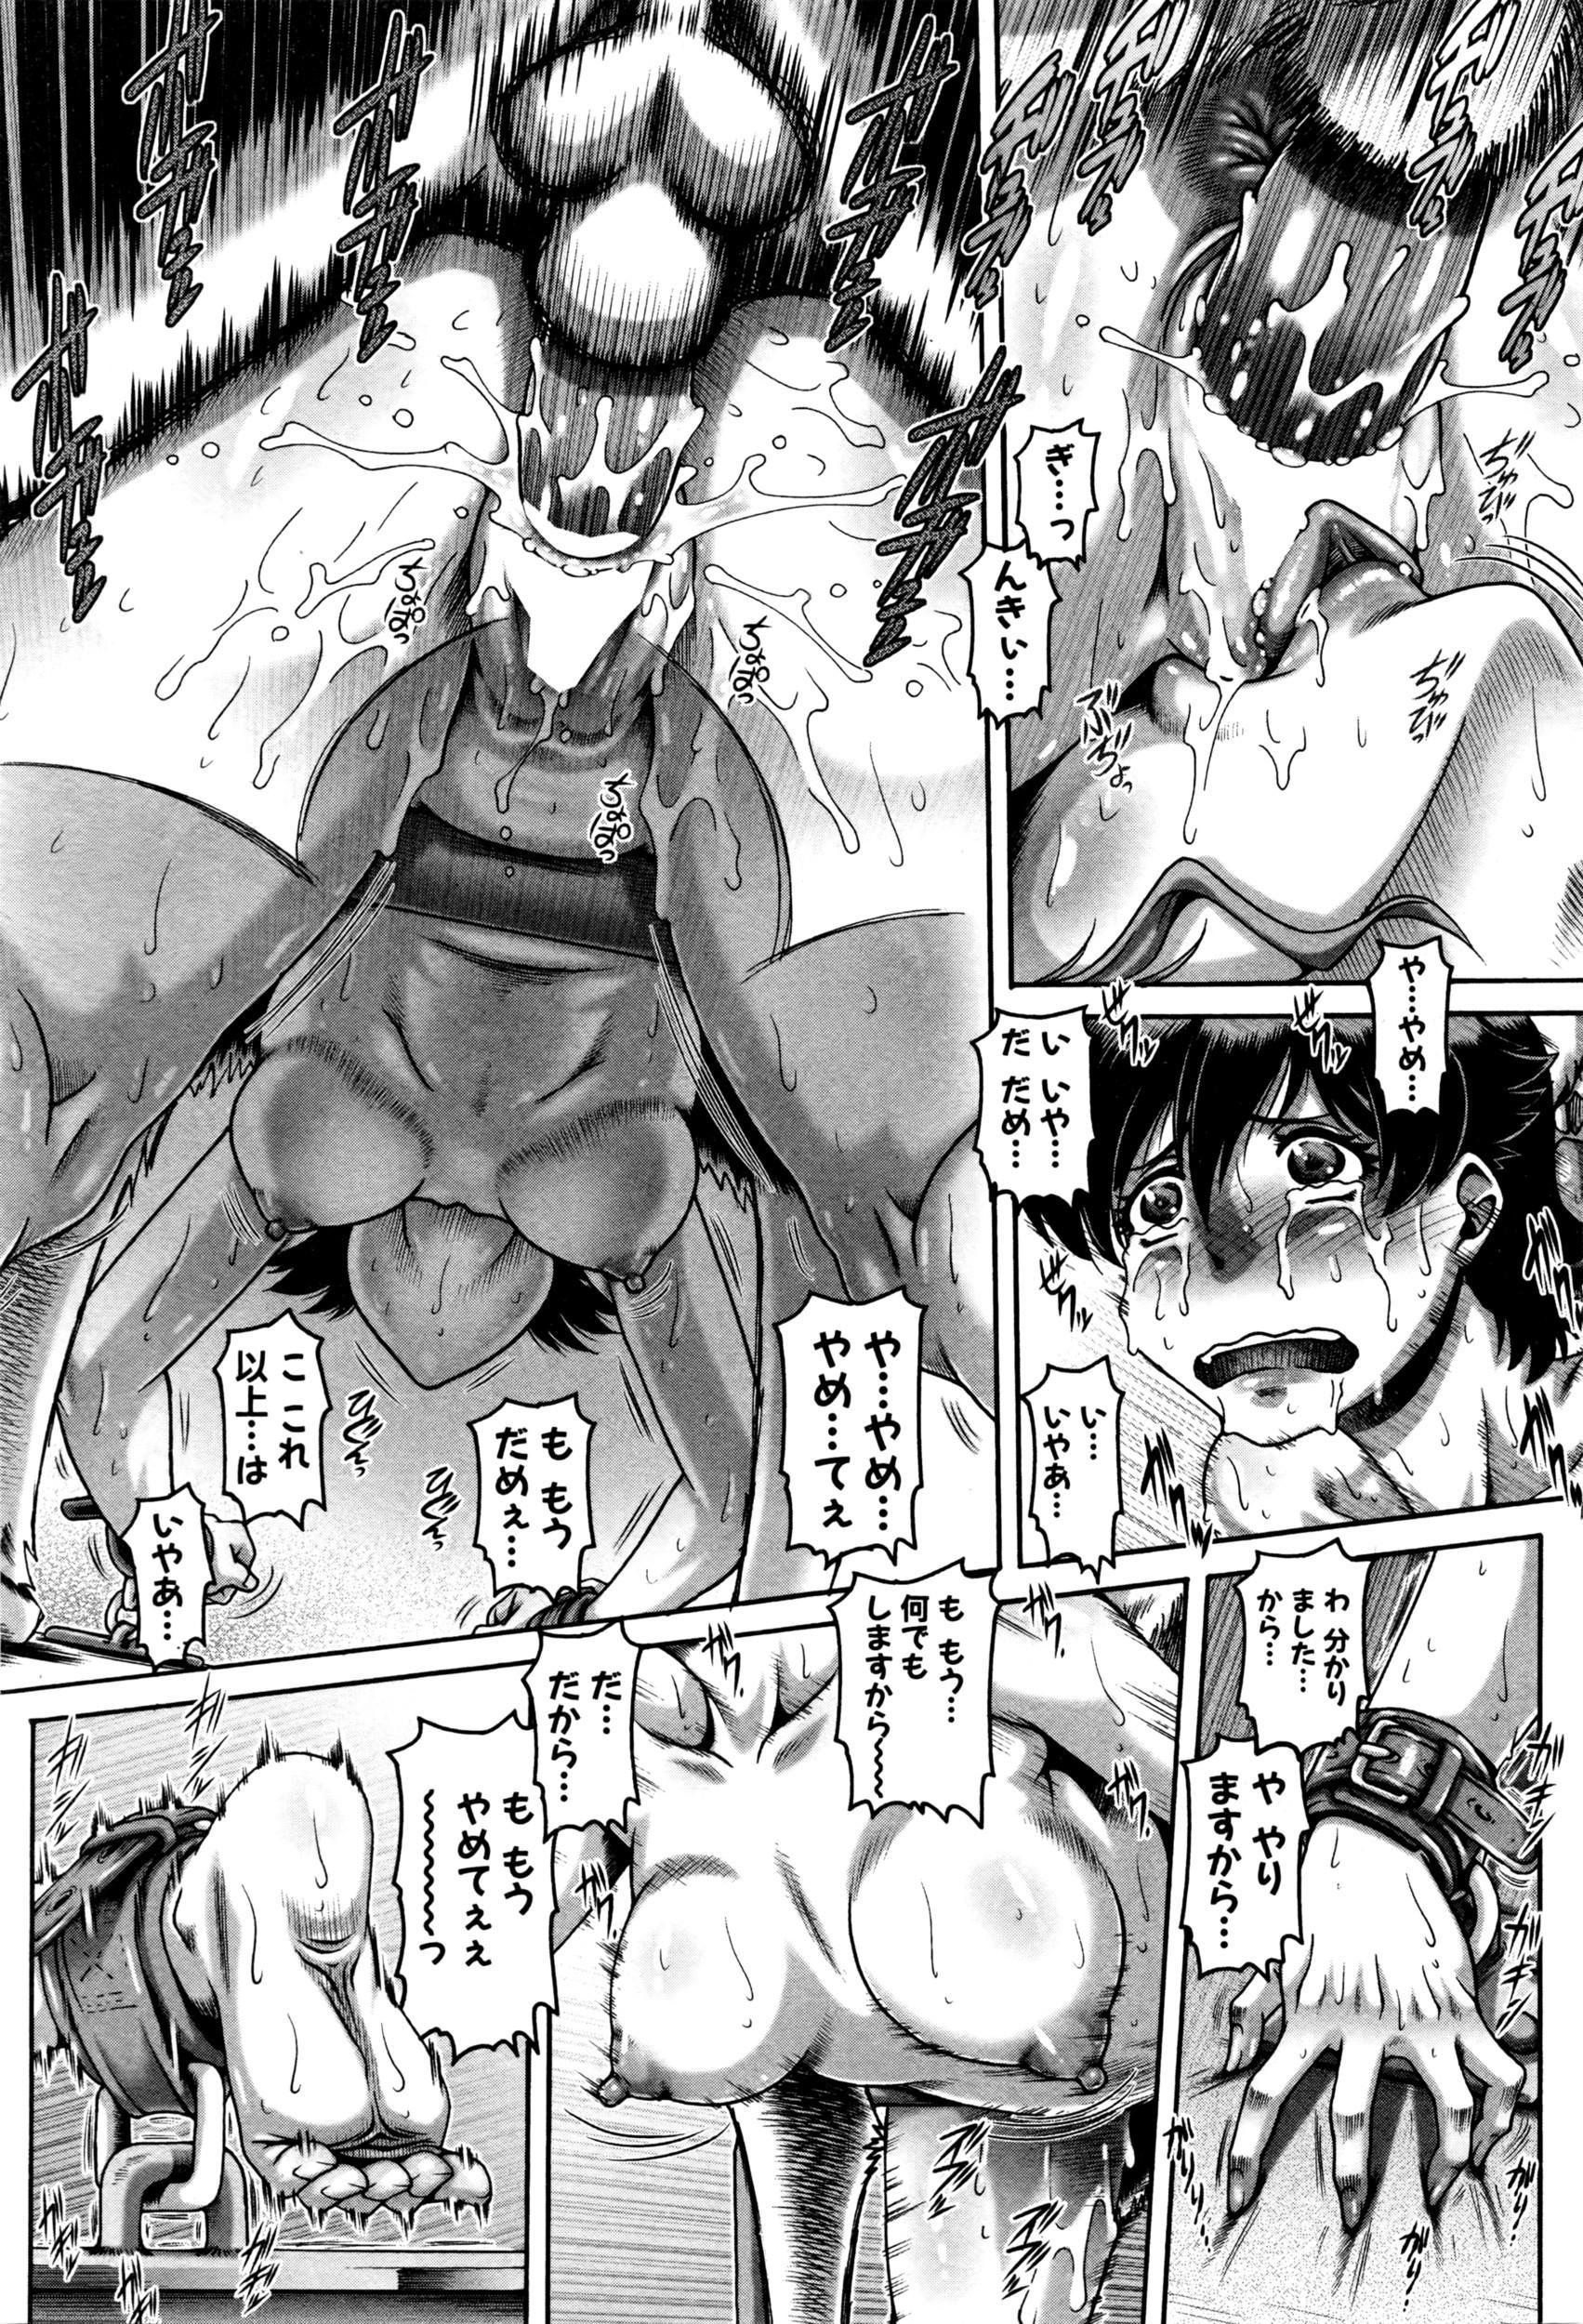 雌への付加家畜 - COMIC MILF Vol.30 COMIC 夢幻転生 2016年6月号増刊 22